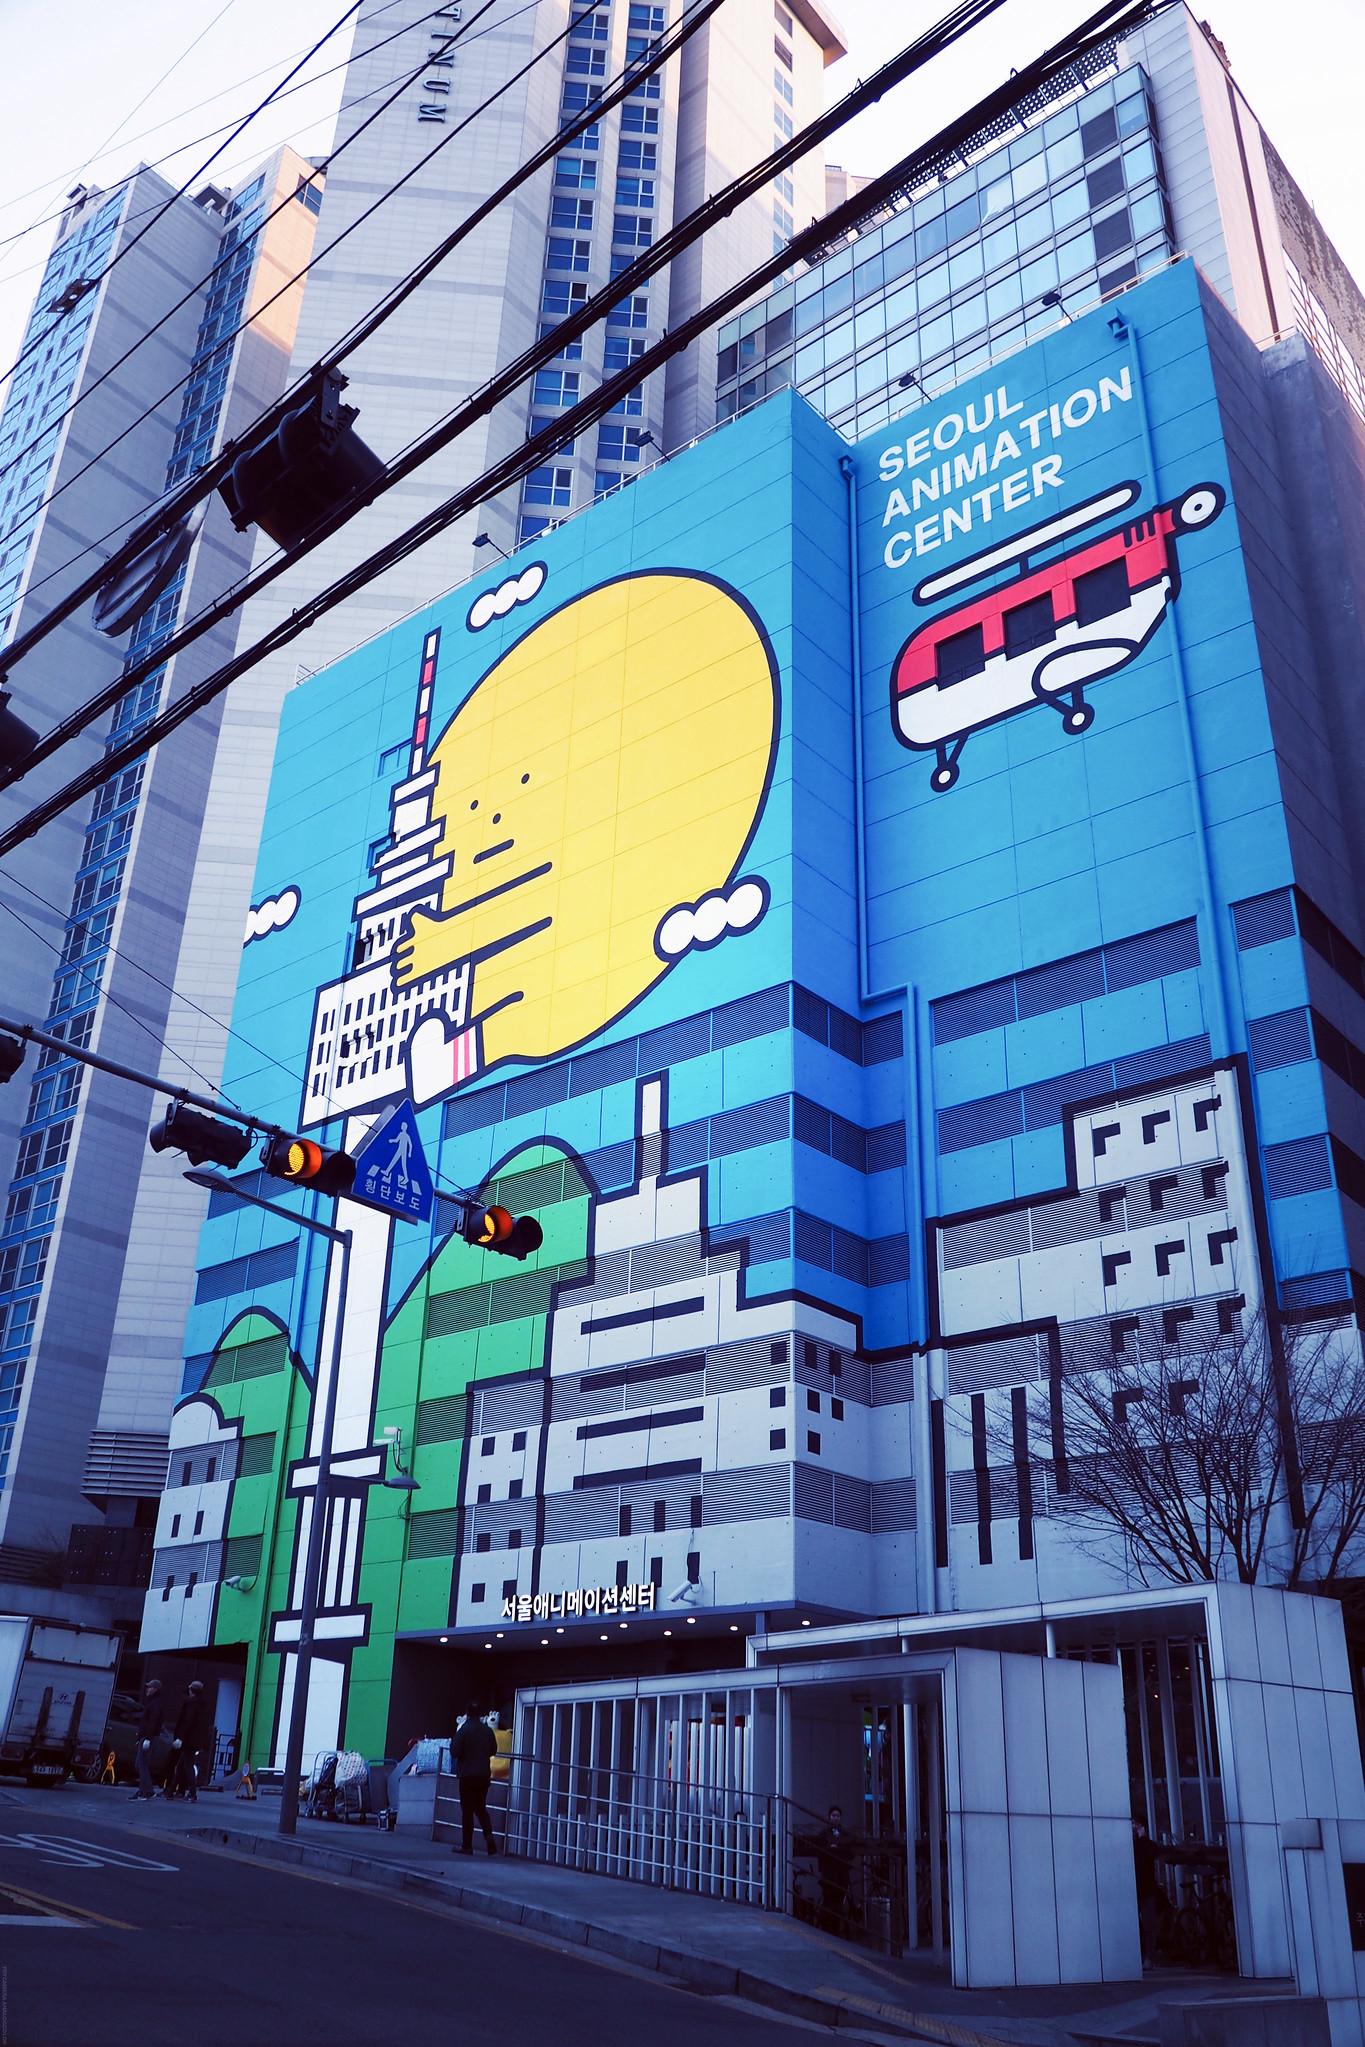 Animation Centre Seoul South Korea 2019